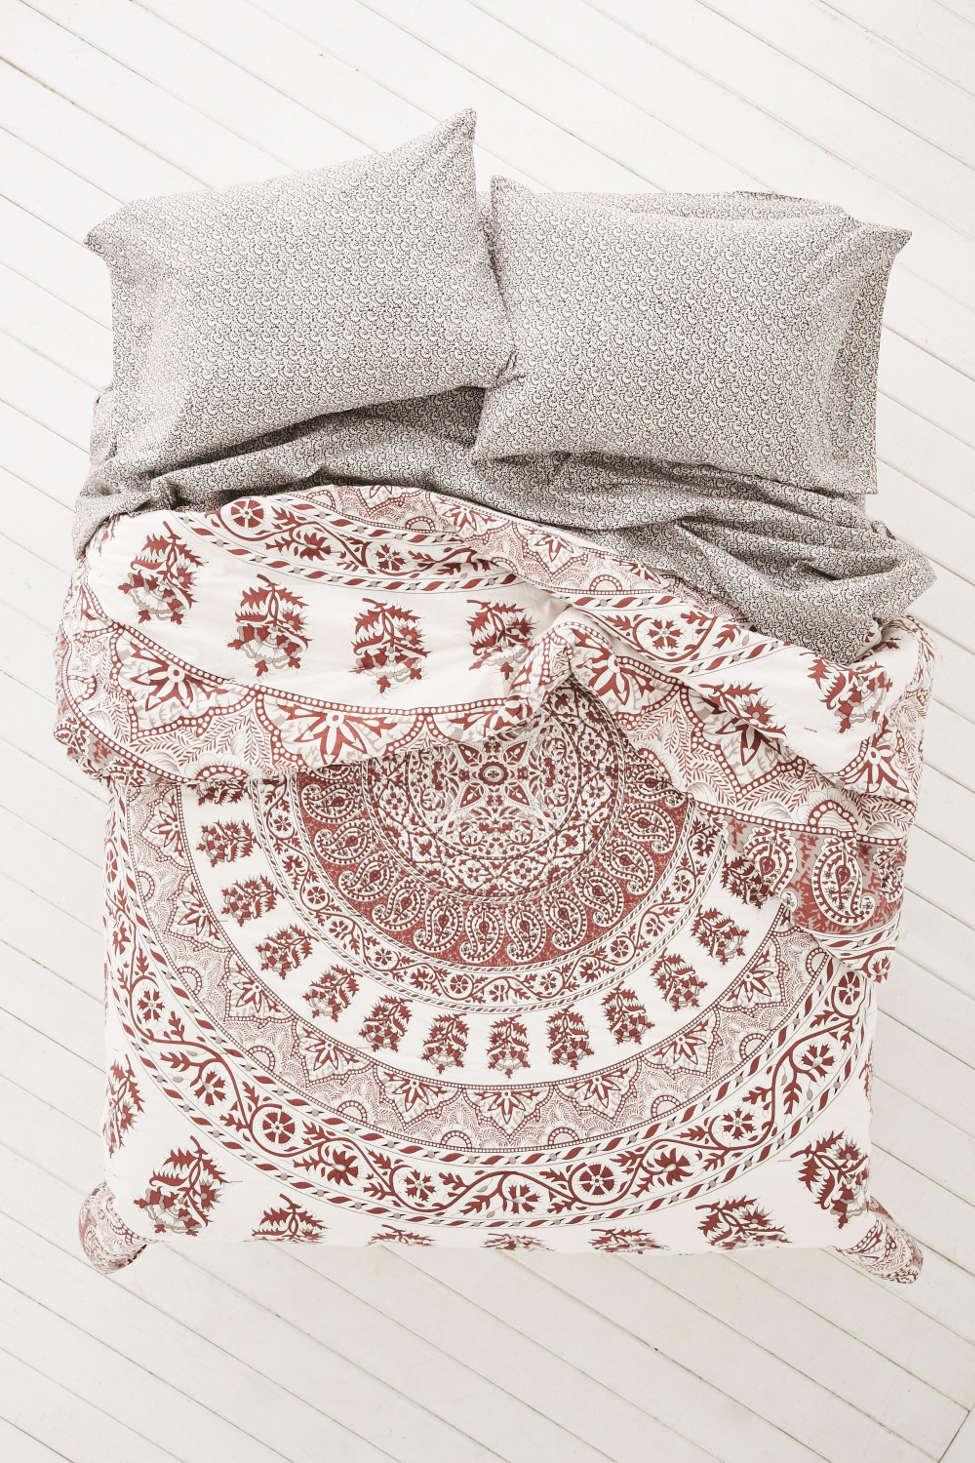 plum & bow kerala medallion comforter snooze set | urban outfitters